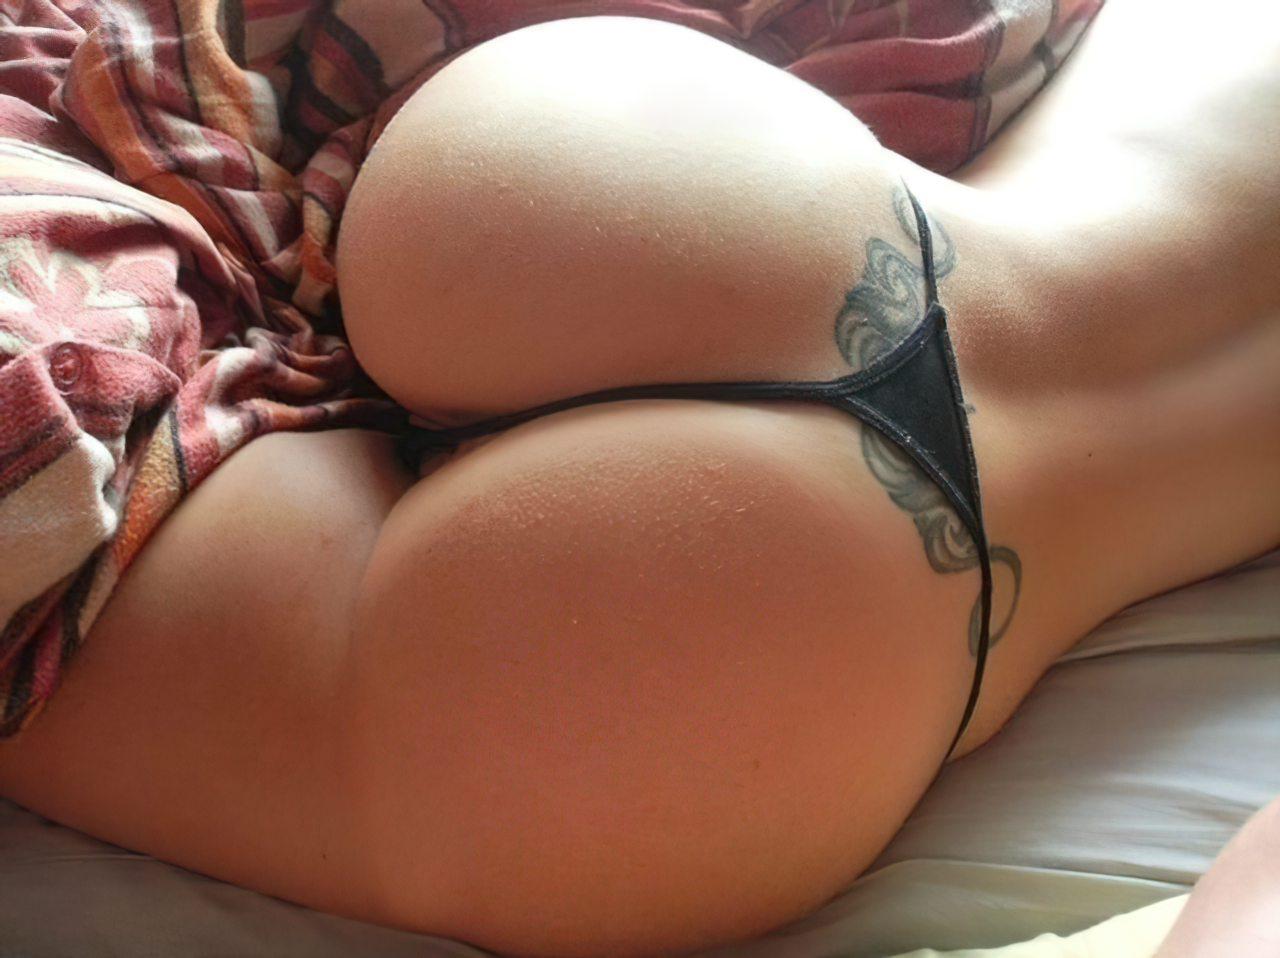 Fotos de Mulheres Nuas (36)